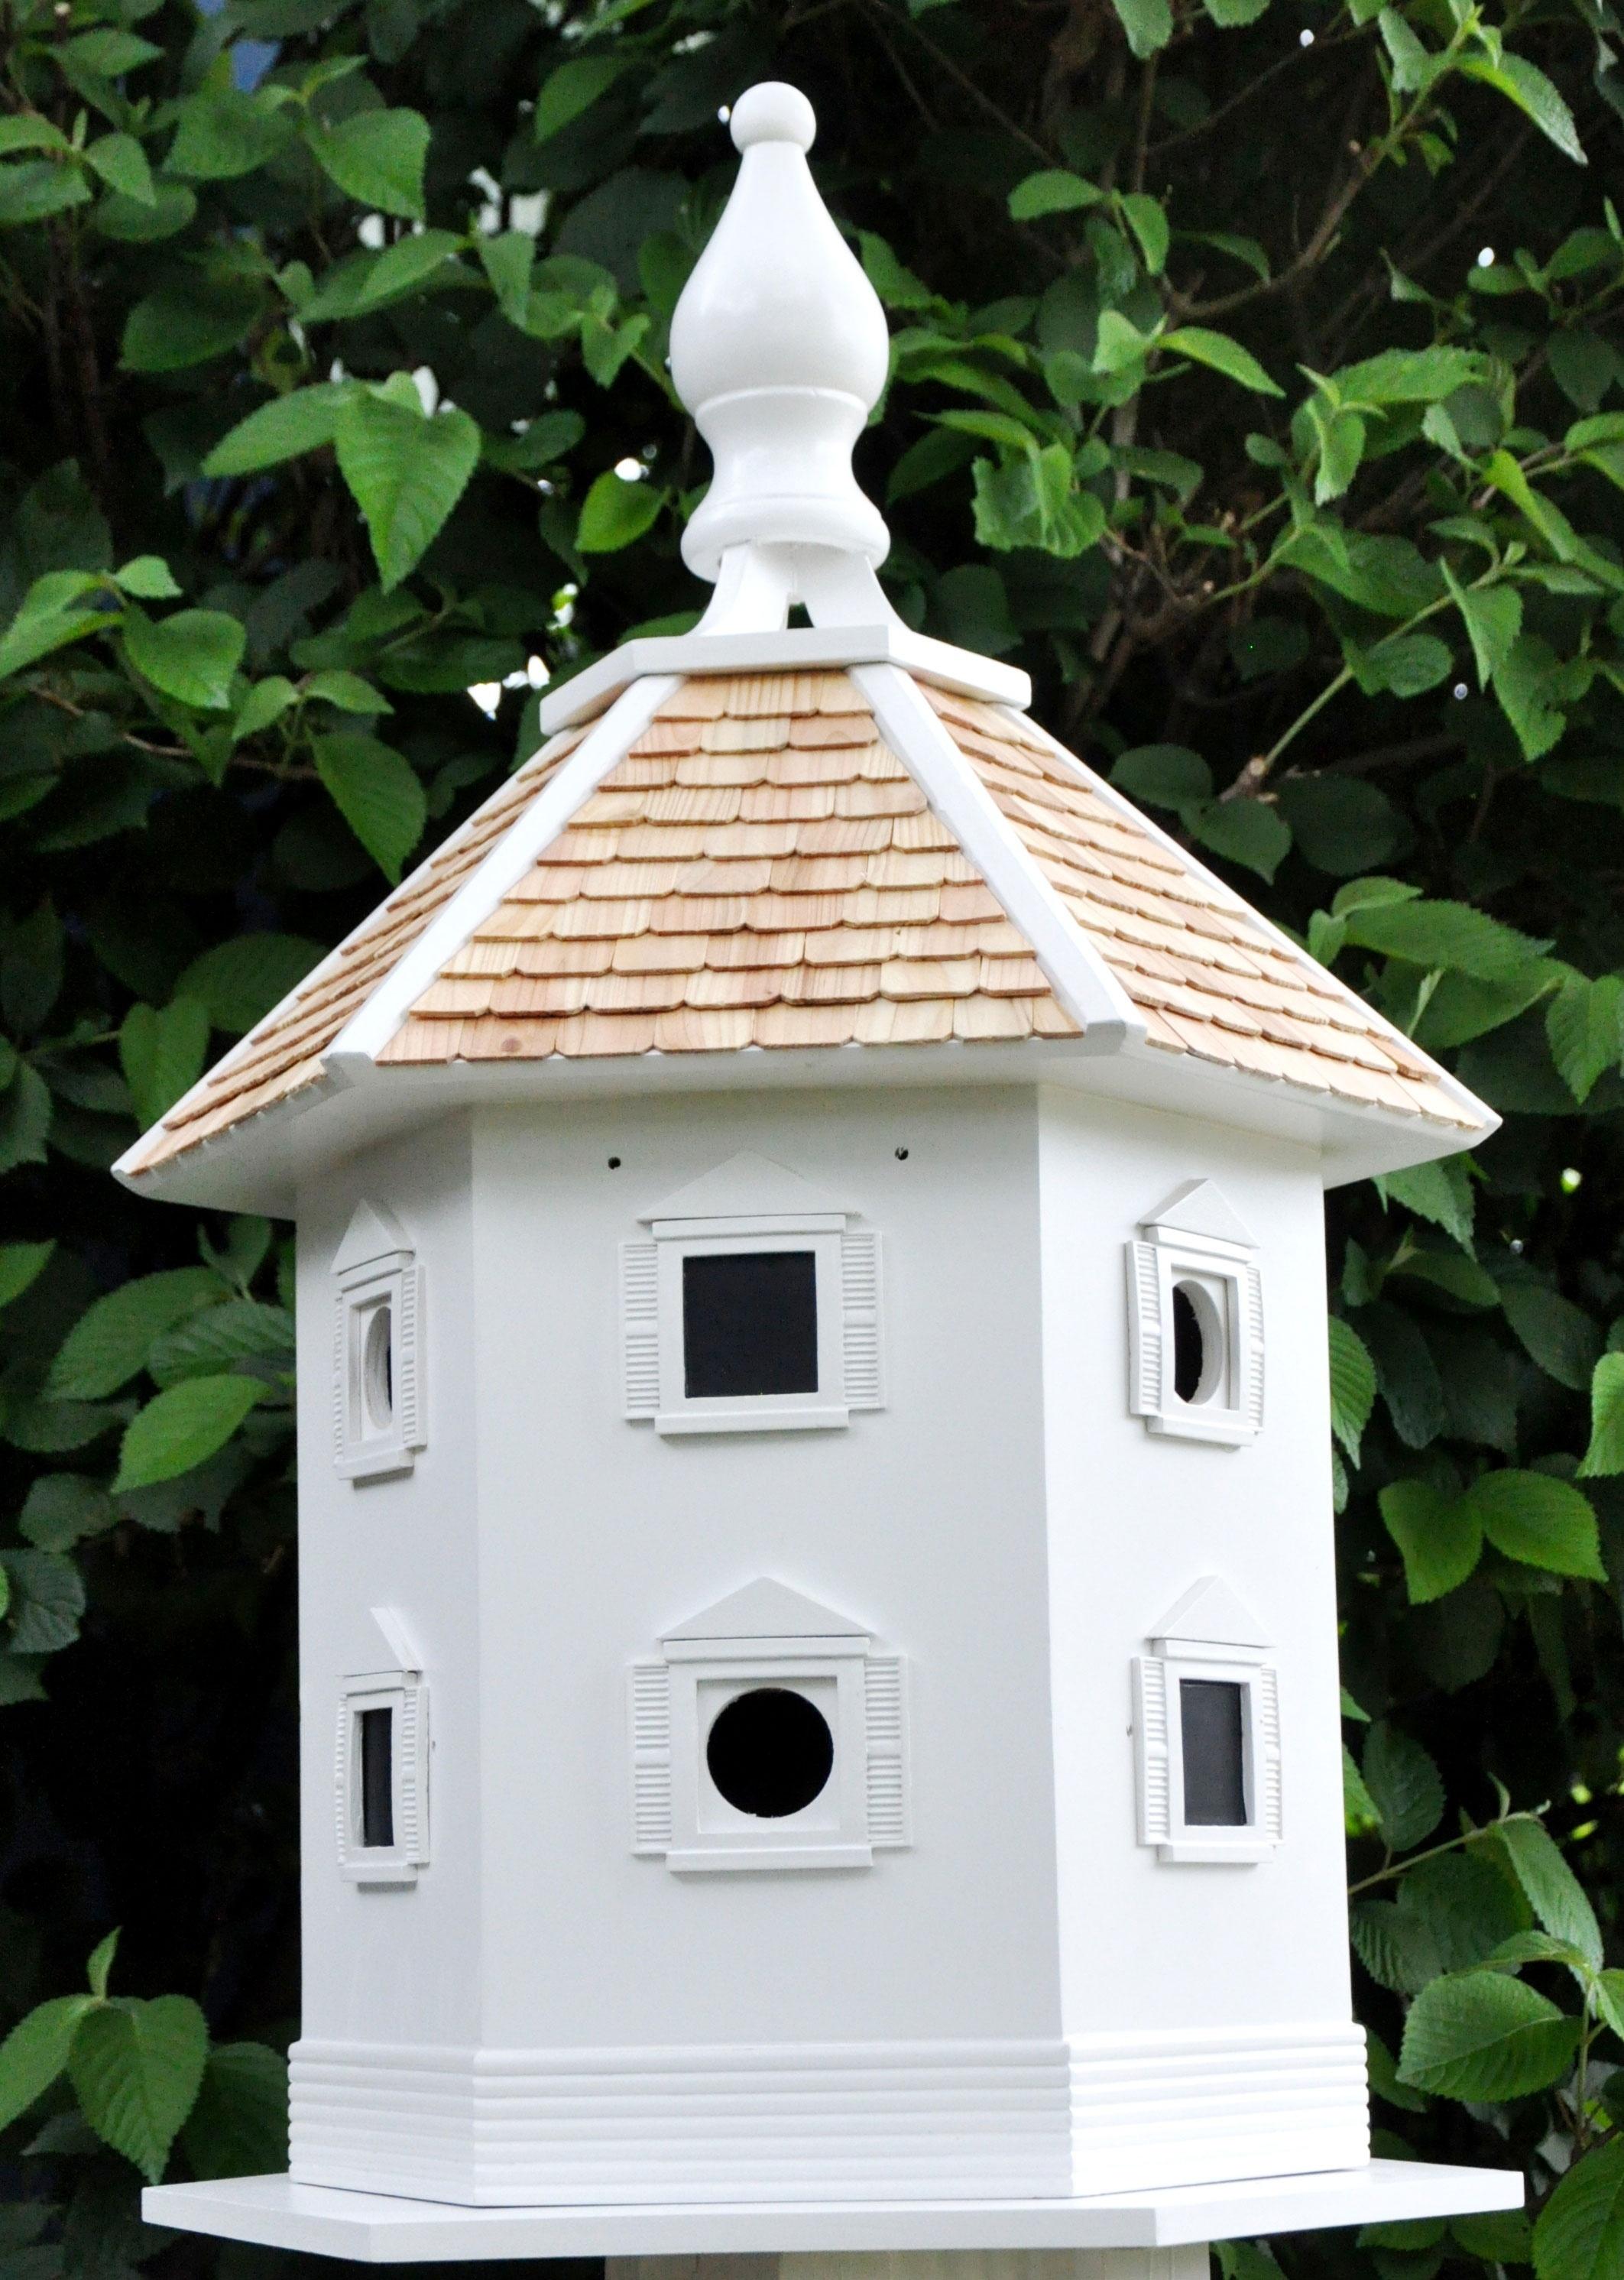 White danbury dovecote 6 room bird house yard envy for Different bird houses